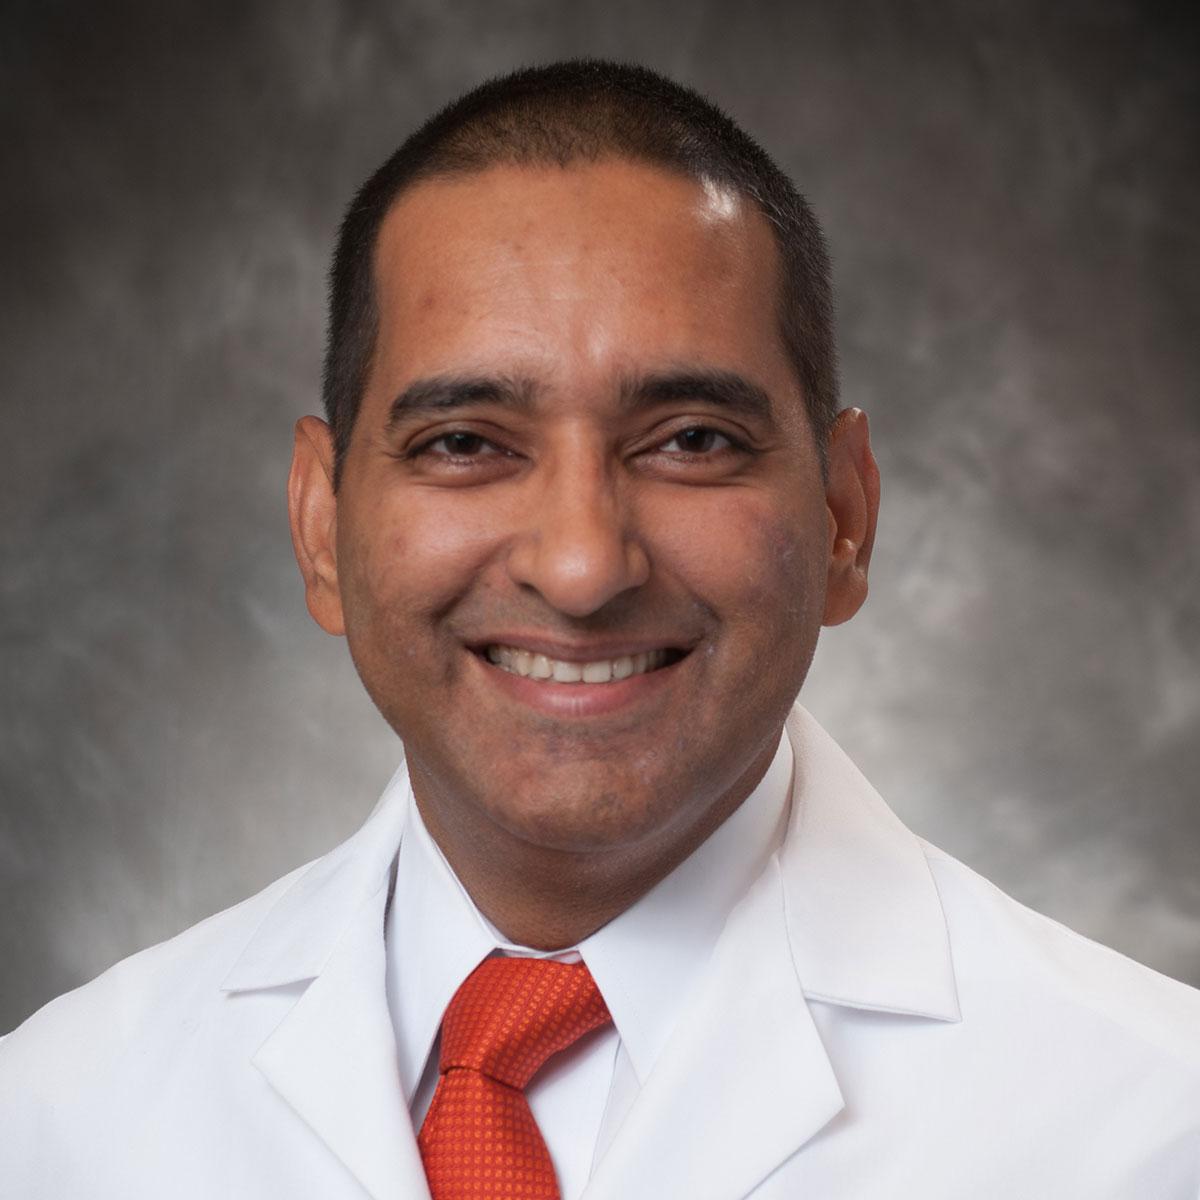 A friendly headshot of Dr. Asif Saberi